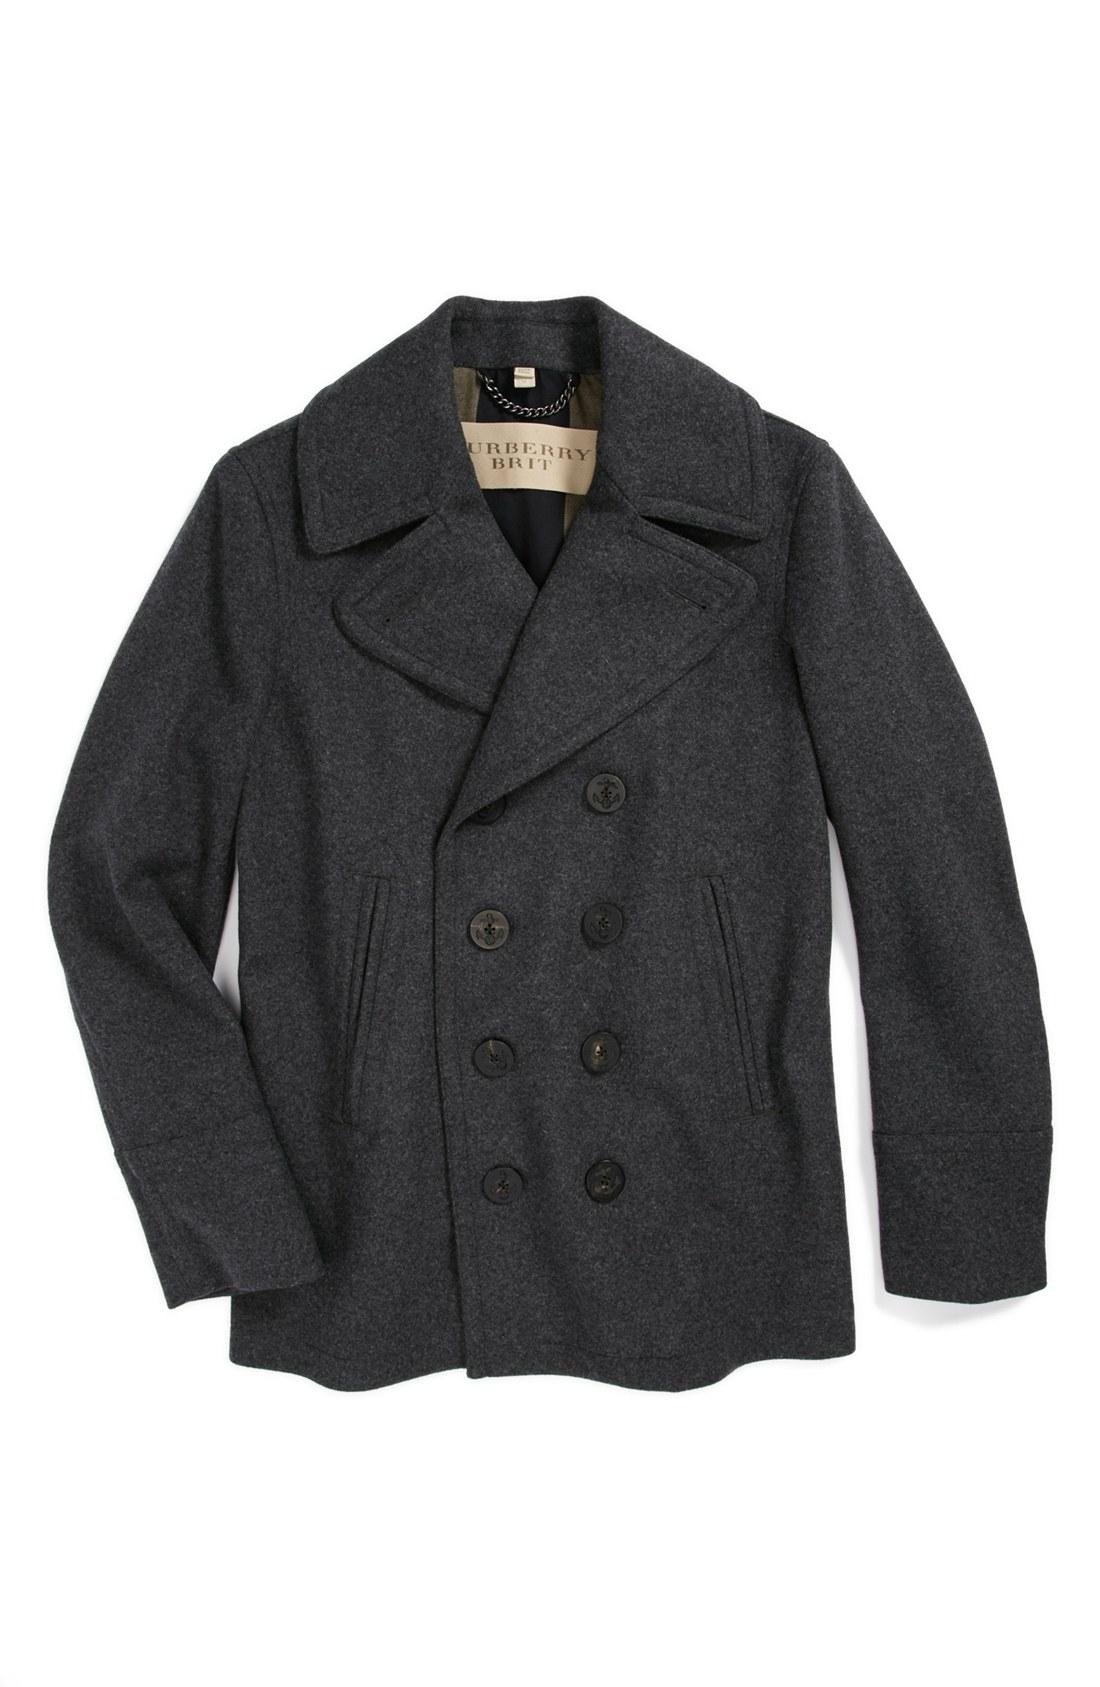 Burberry Brit Eckford Jacket In Gray For Men Dark Grey